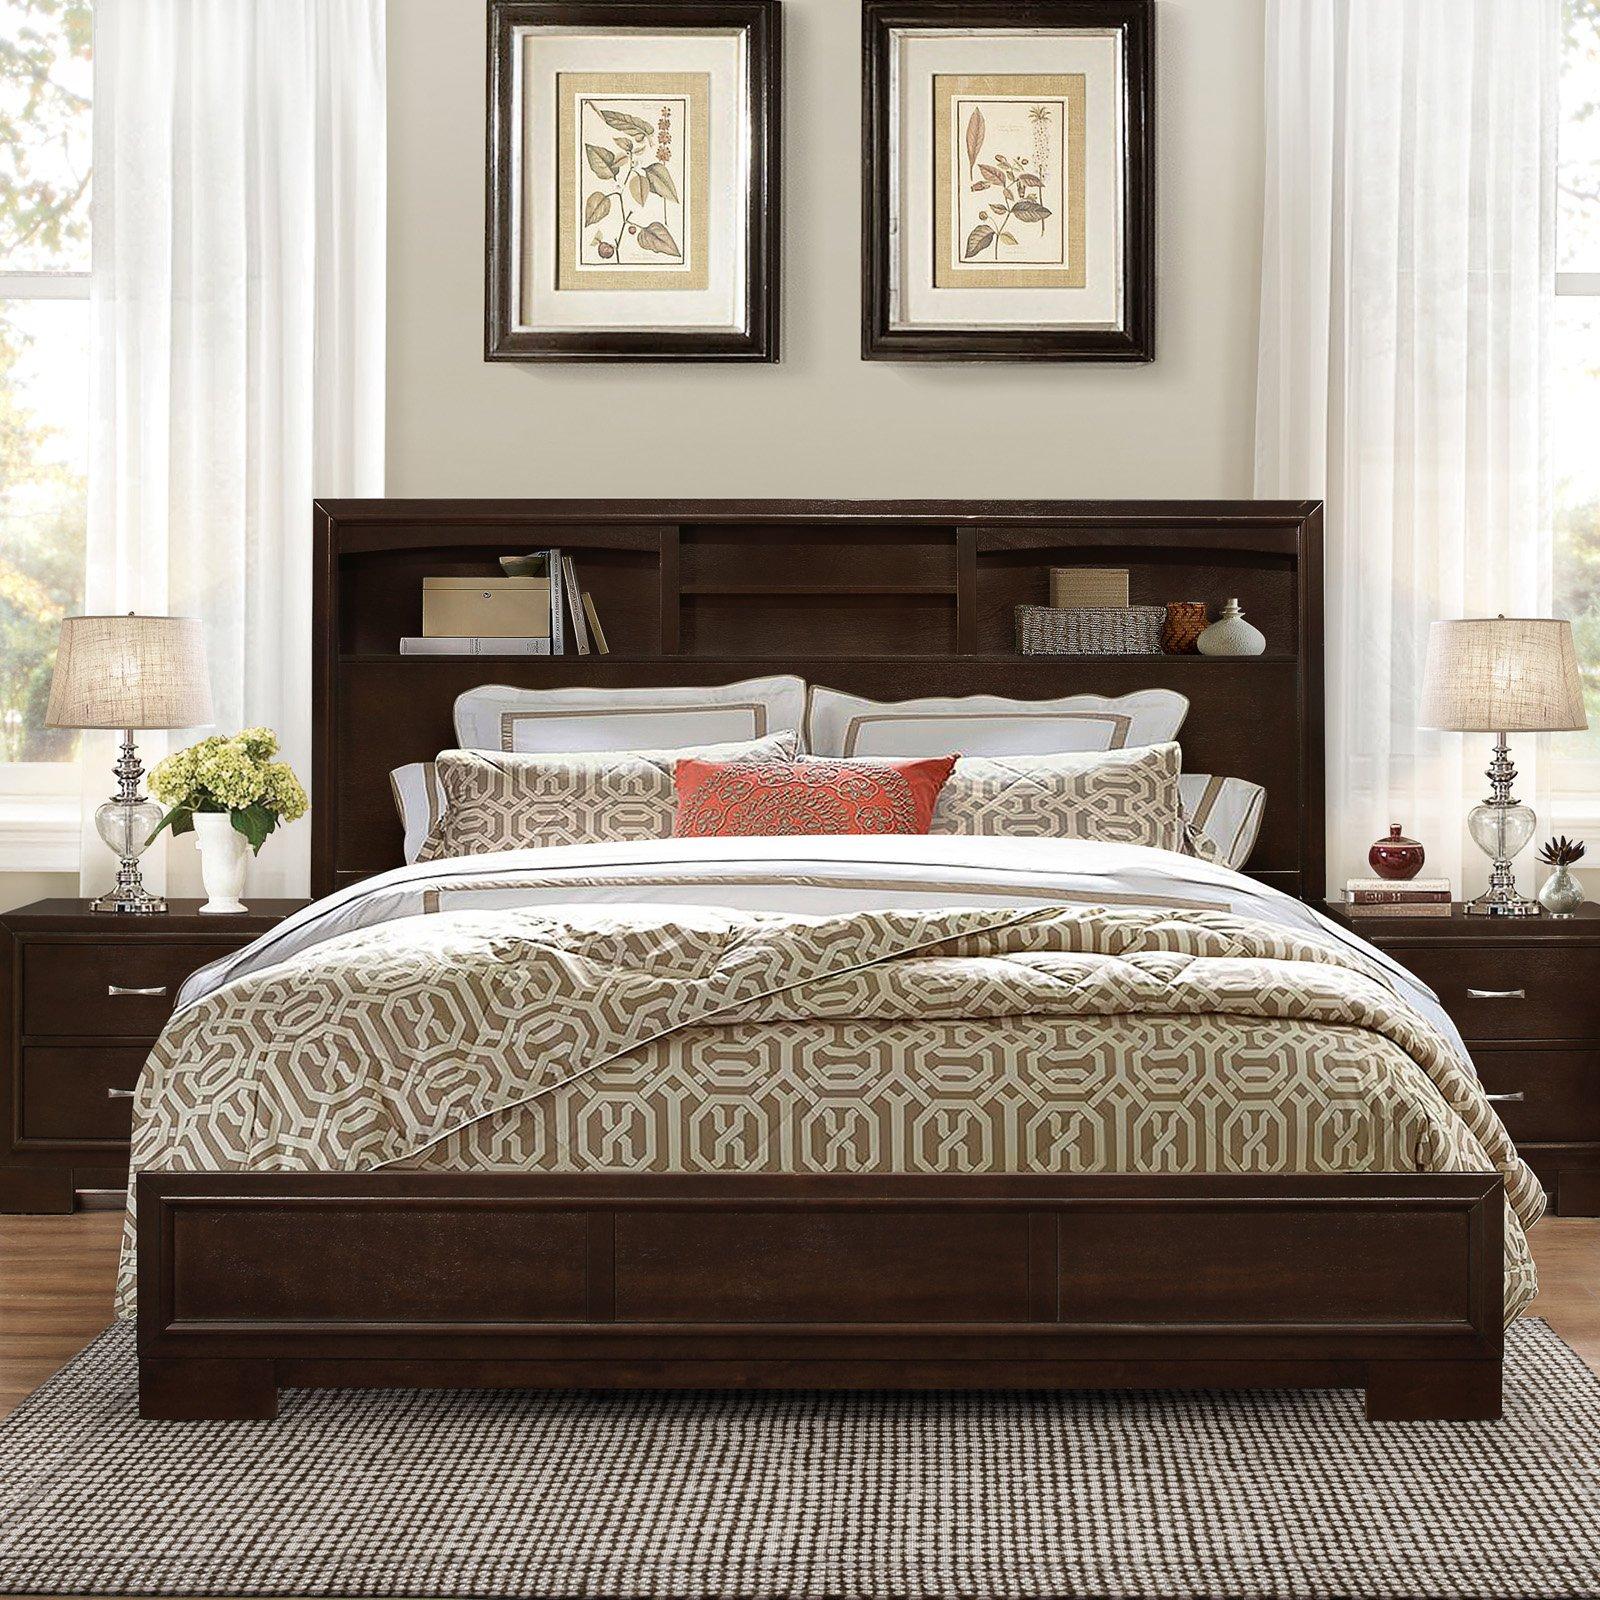 Roundhill Furniture Montana Bookcase Platform Bed, Size